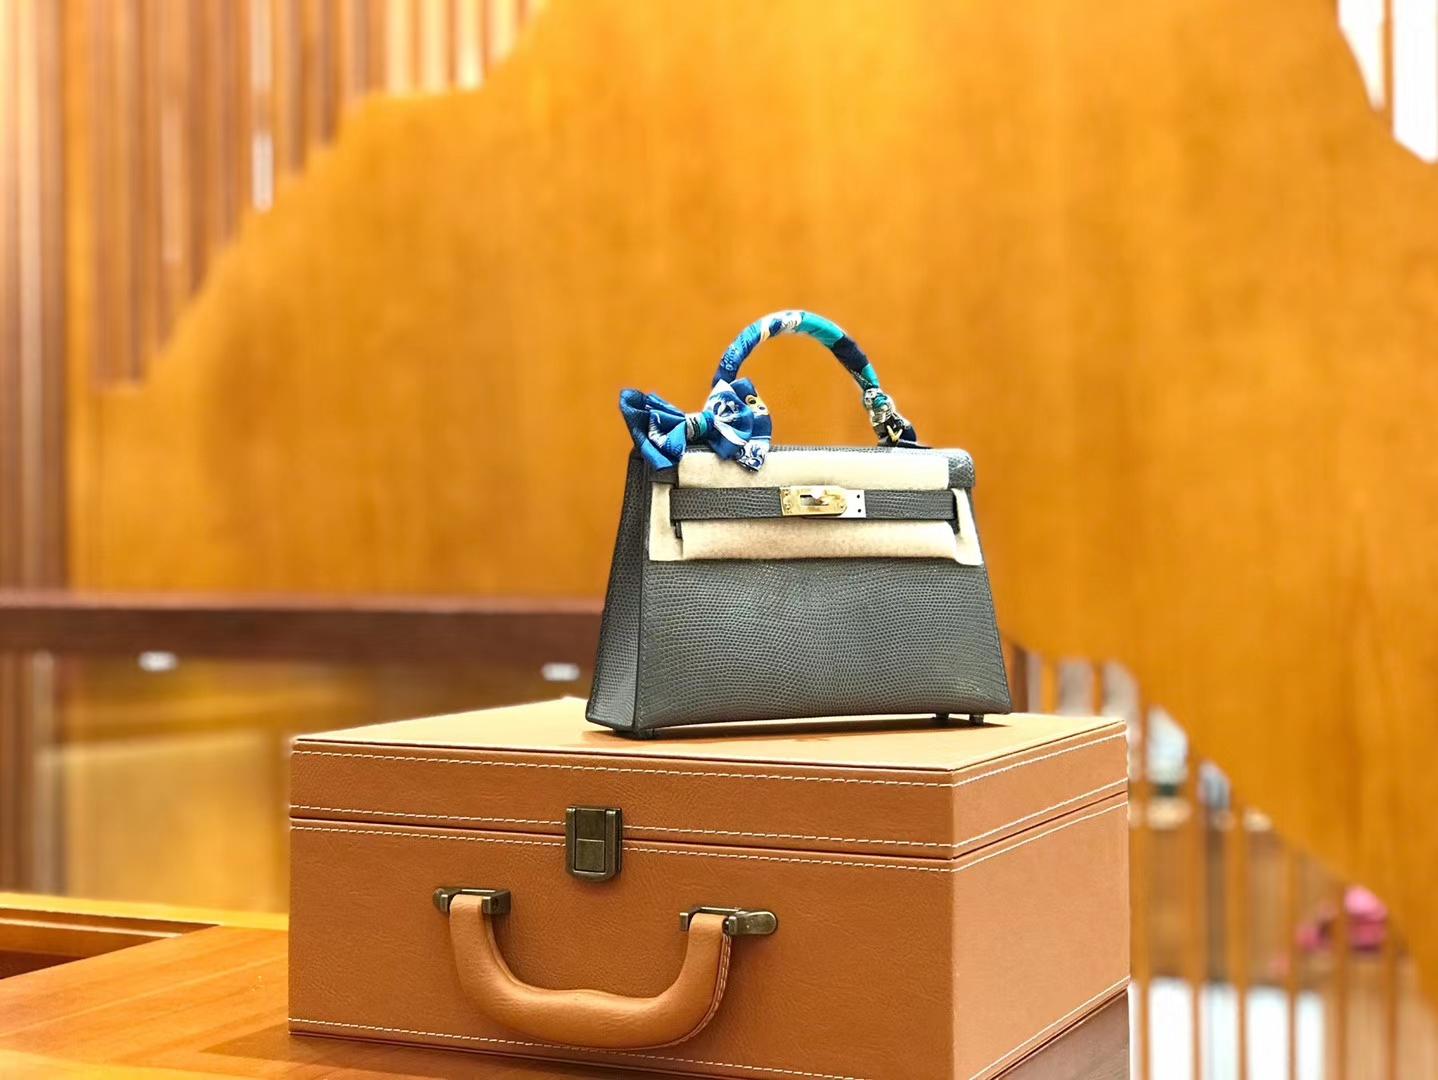 Hermès(爱马仕)mini 2代 19cm 蜥蜴皮 铁灰 金扣 新增现货